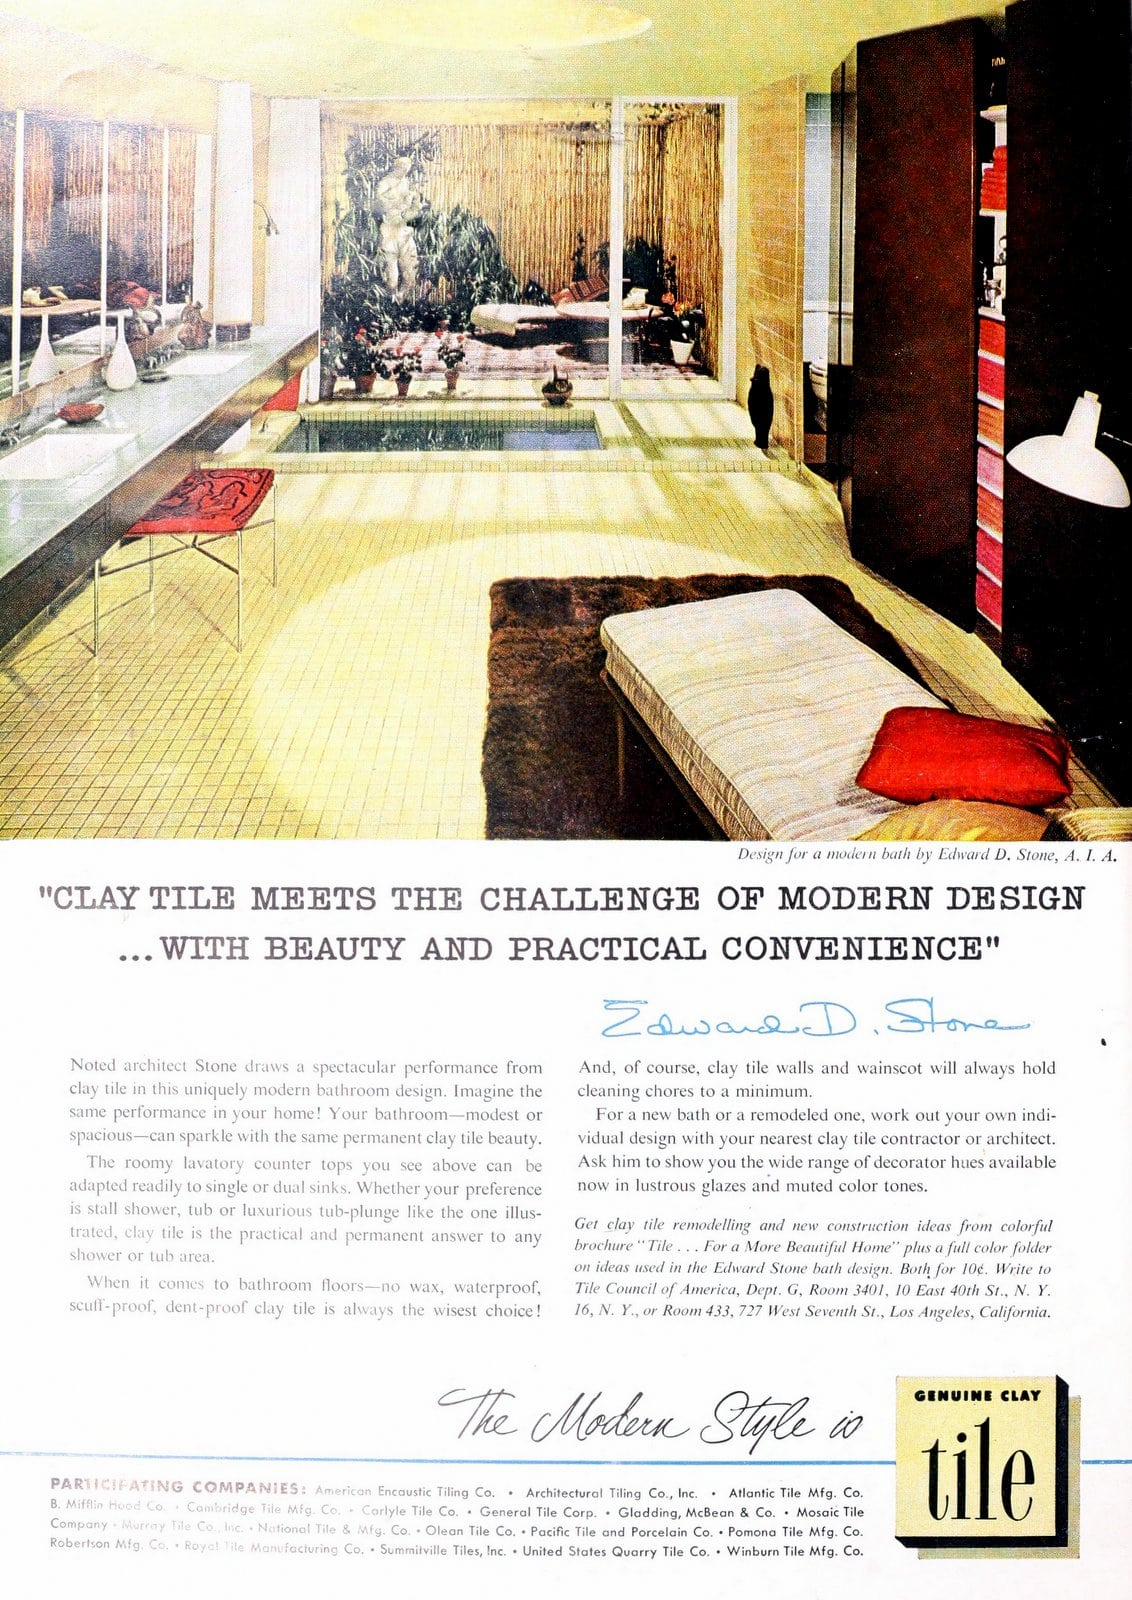 Vintage yellow designer bathroom tile design (1953)